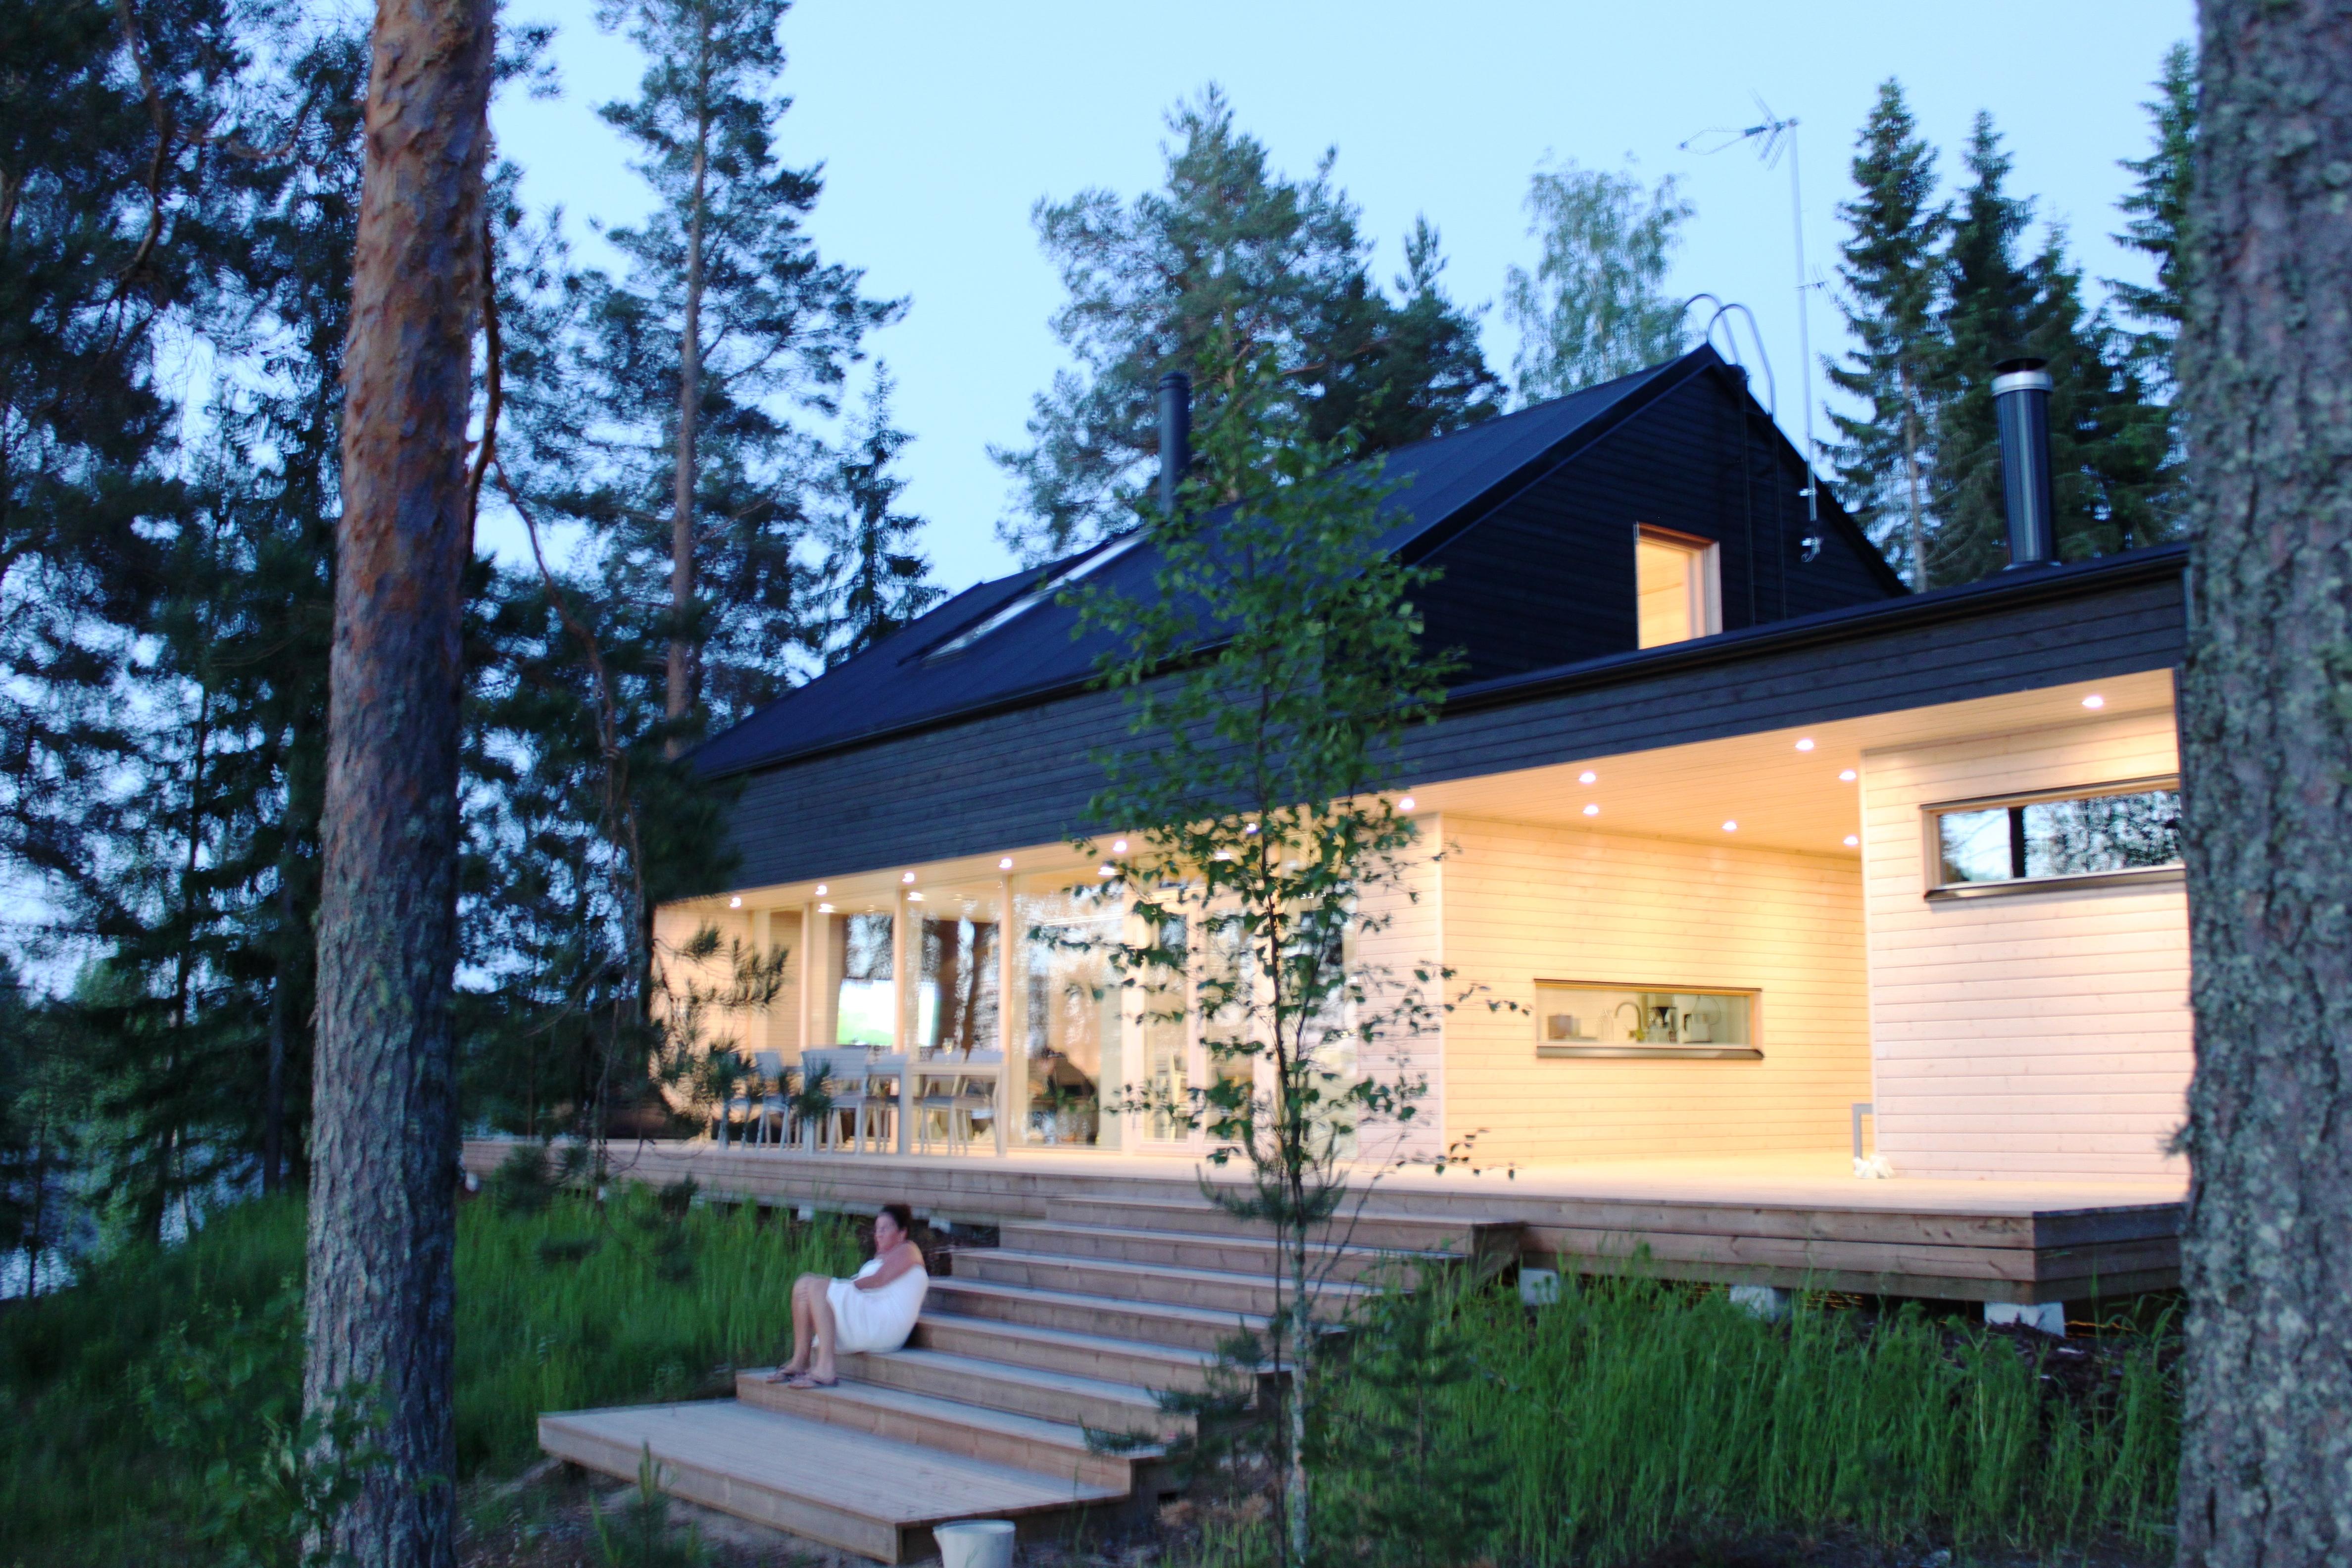 lieblingsfleck sauna saunieren in finnland. Black Bedroom Furniture Sets. Home Design Ideas